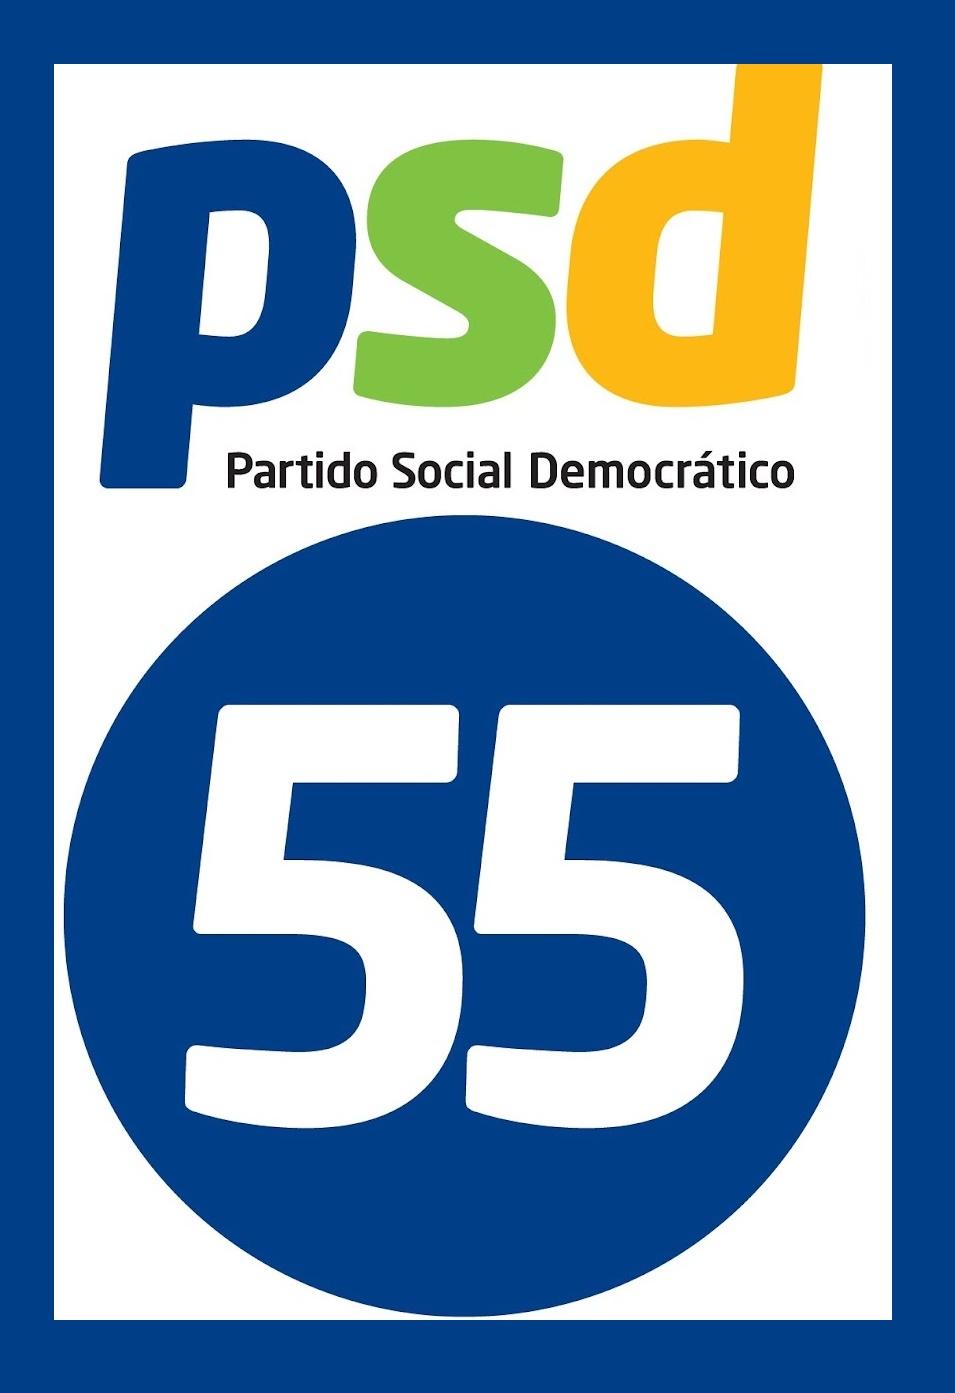 PSD PARTIDO SOCIAL DEMOCRÁTICO